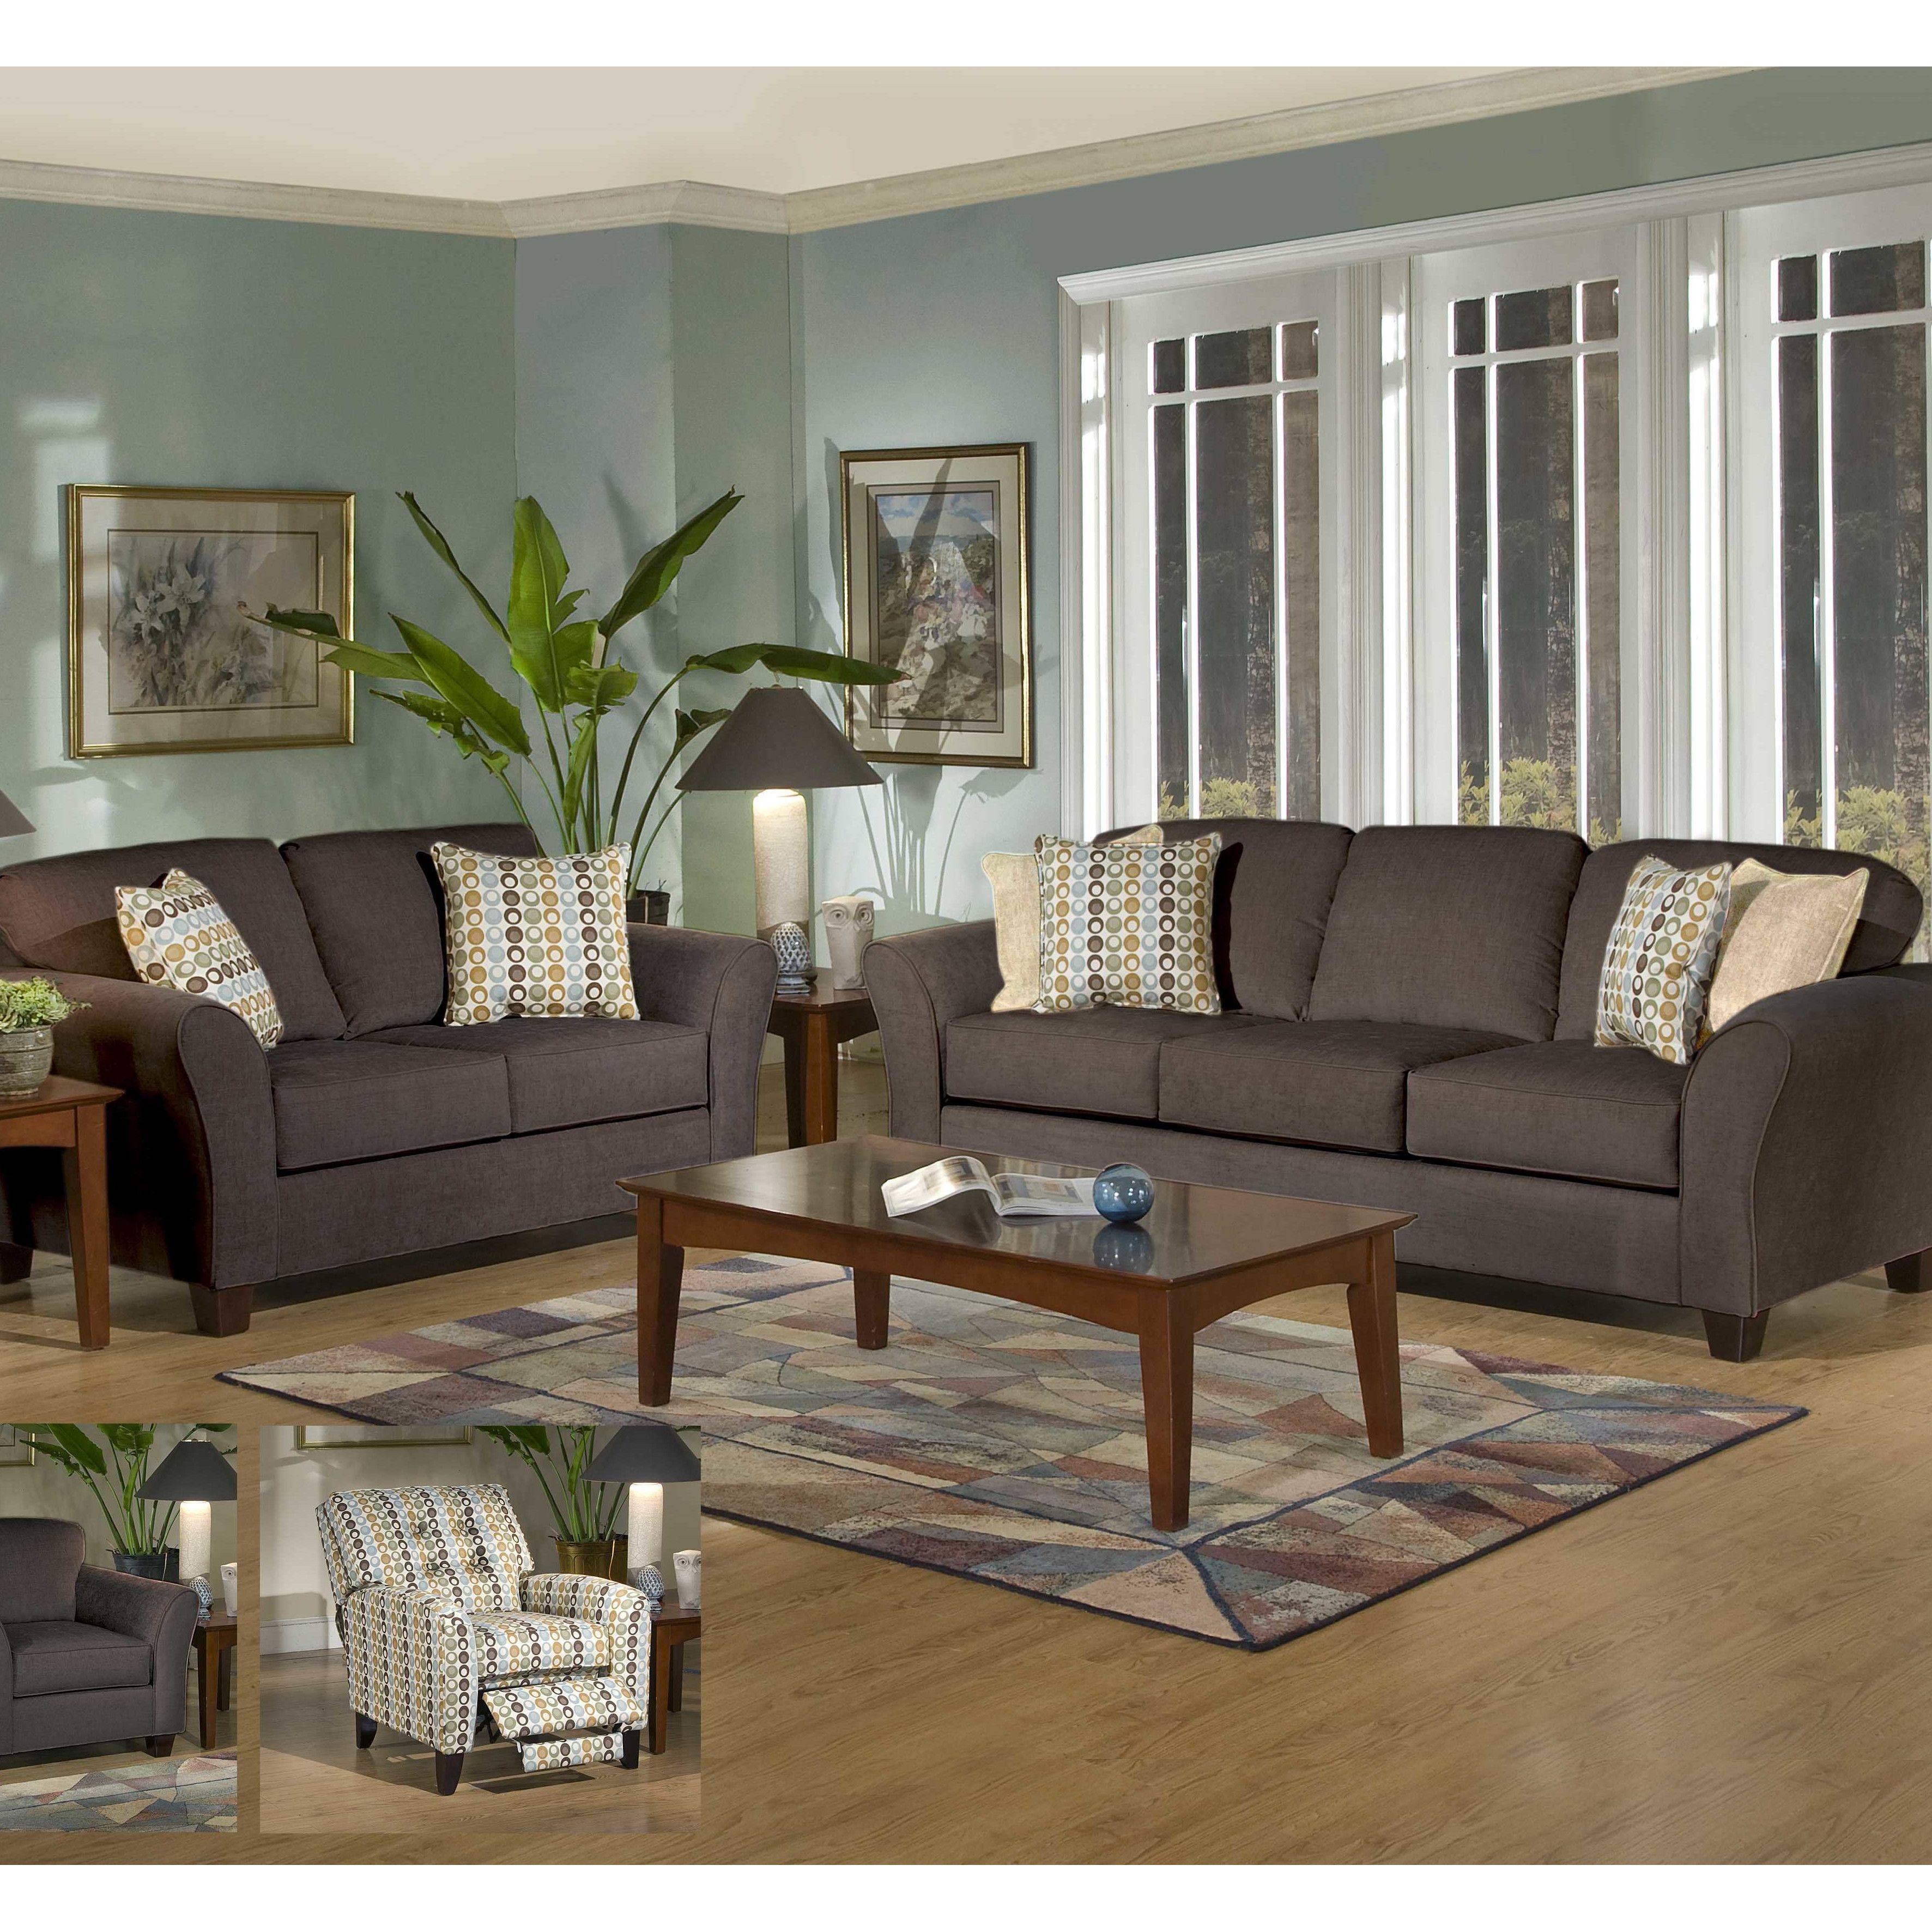 10 Top Serta Living Room Sets